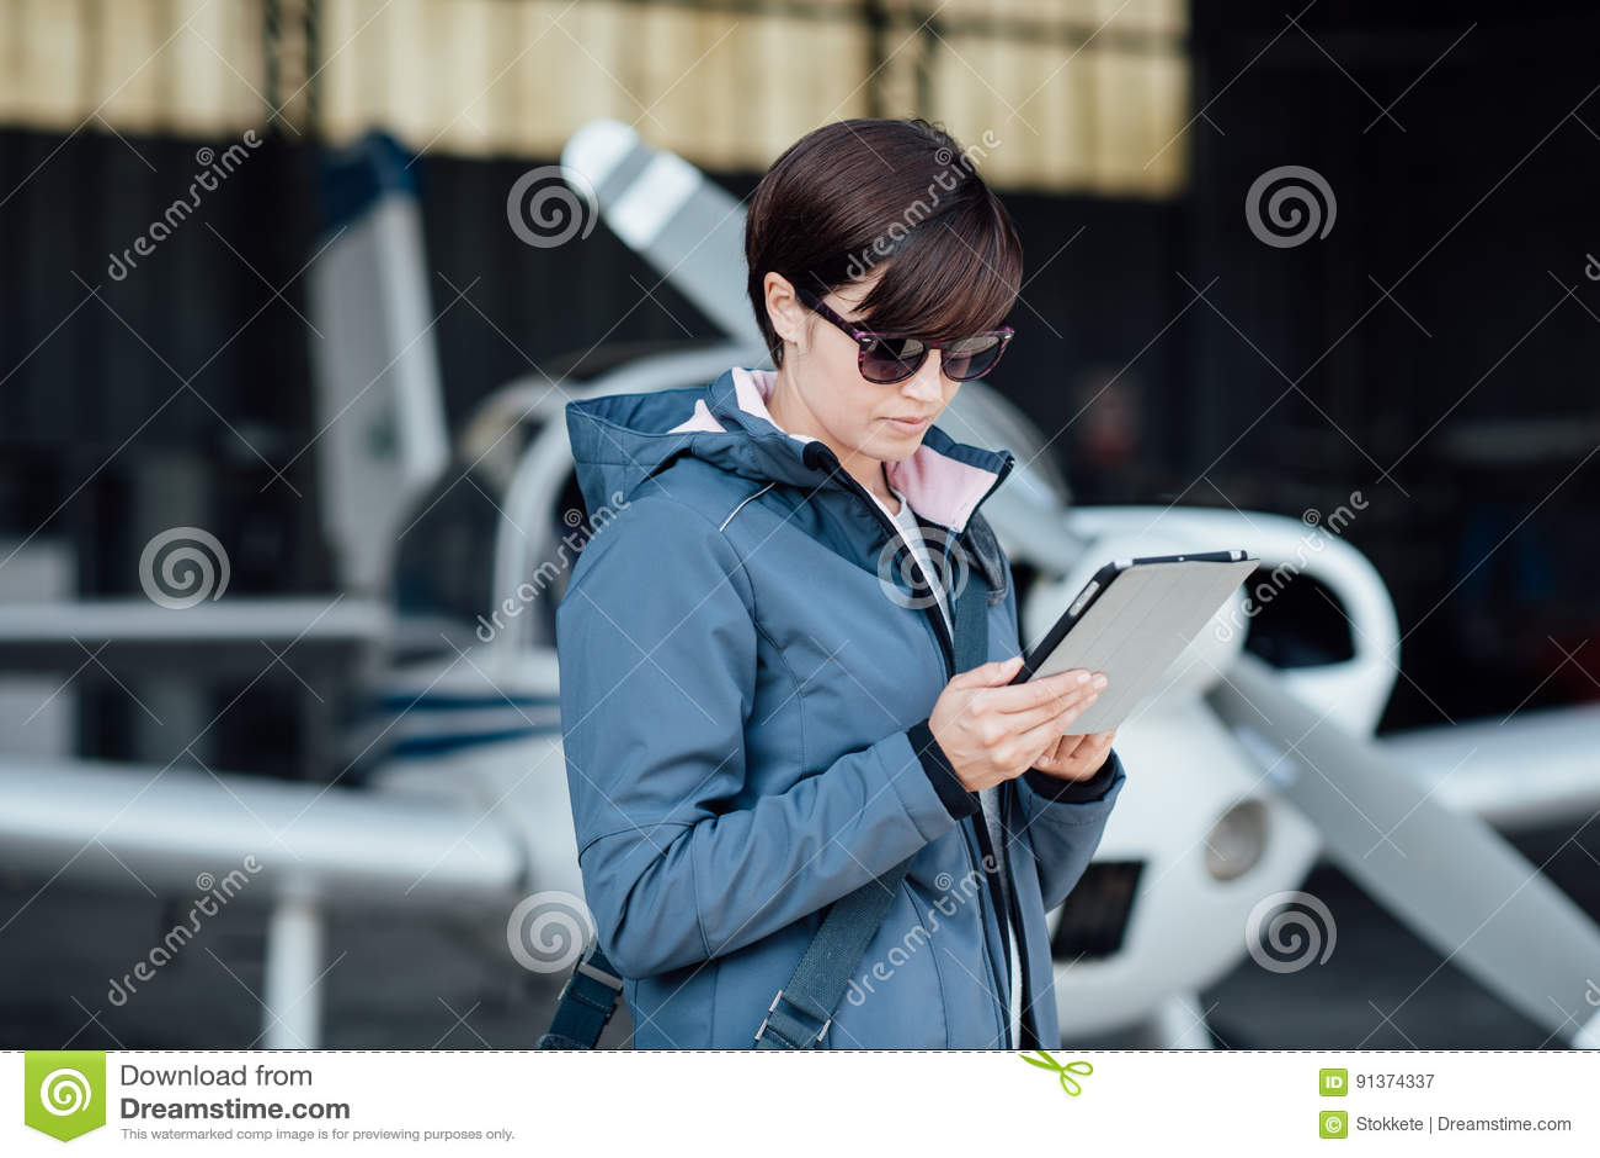 Pilot using aviation apps